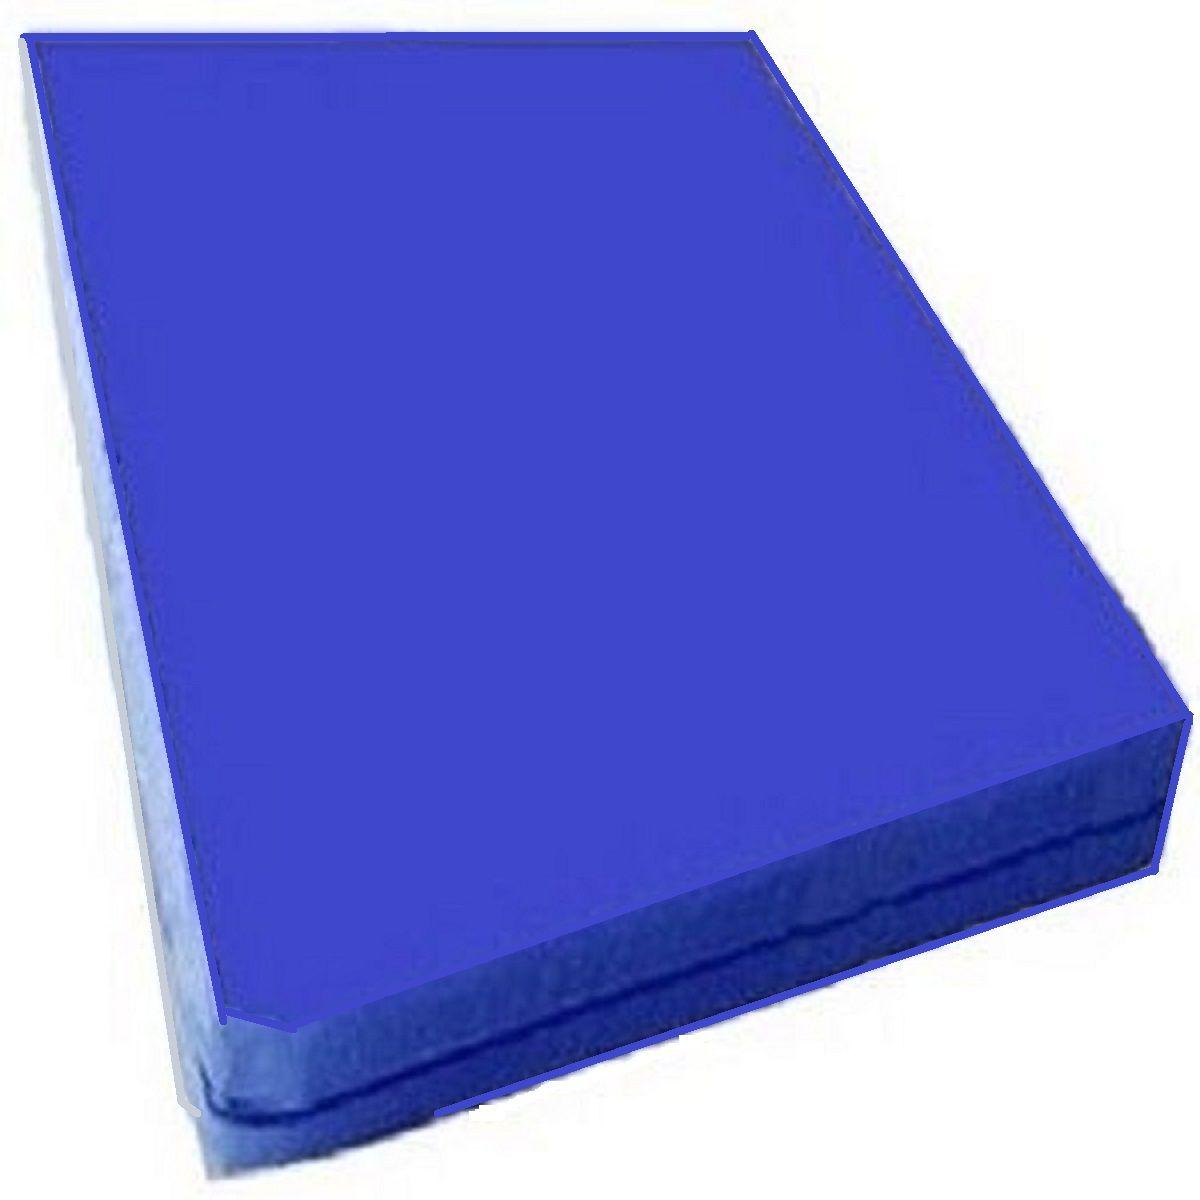 Capa Casal Impermeável Azul Royal Anti alérgica Hospitalar Forrada Com Zíper Medida Especial